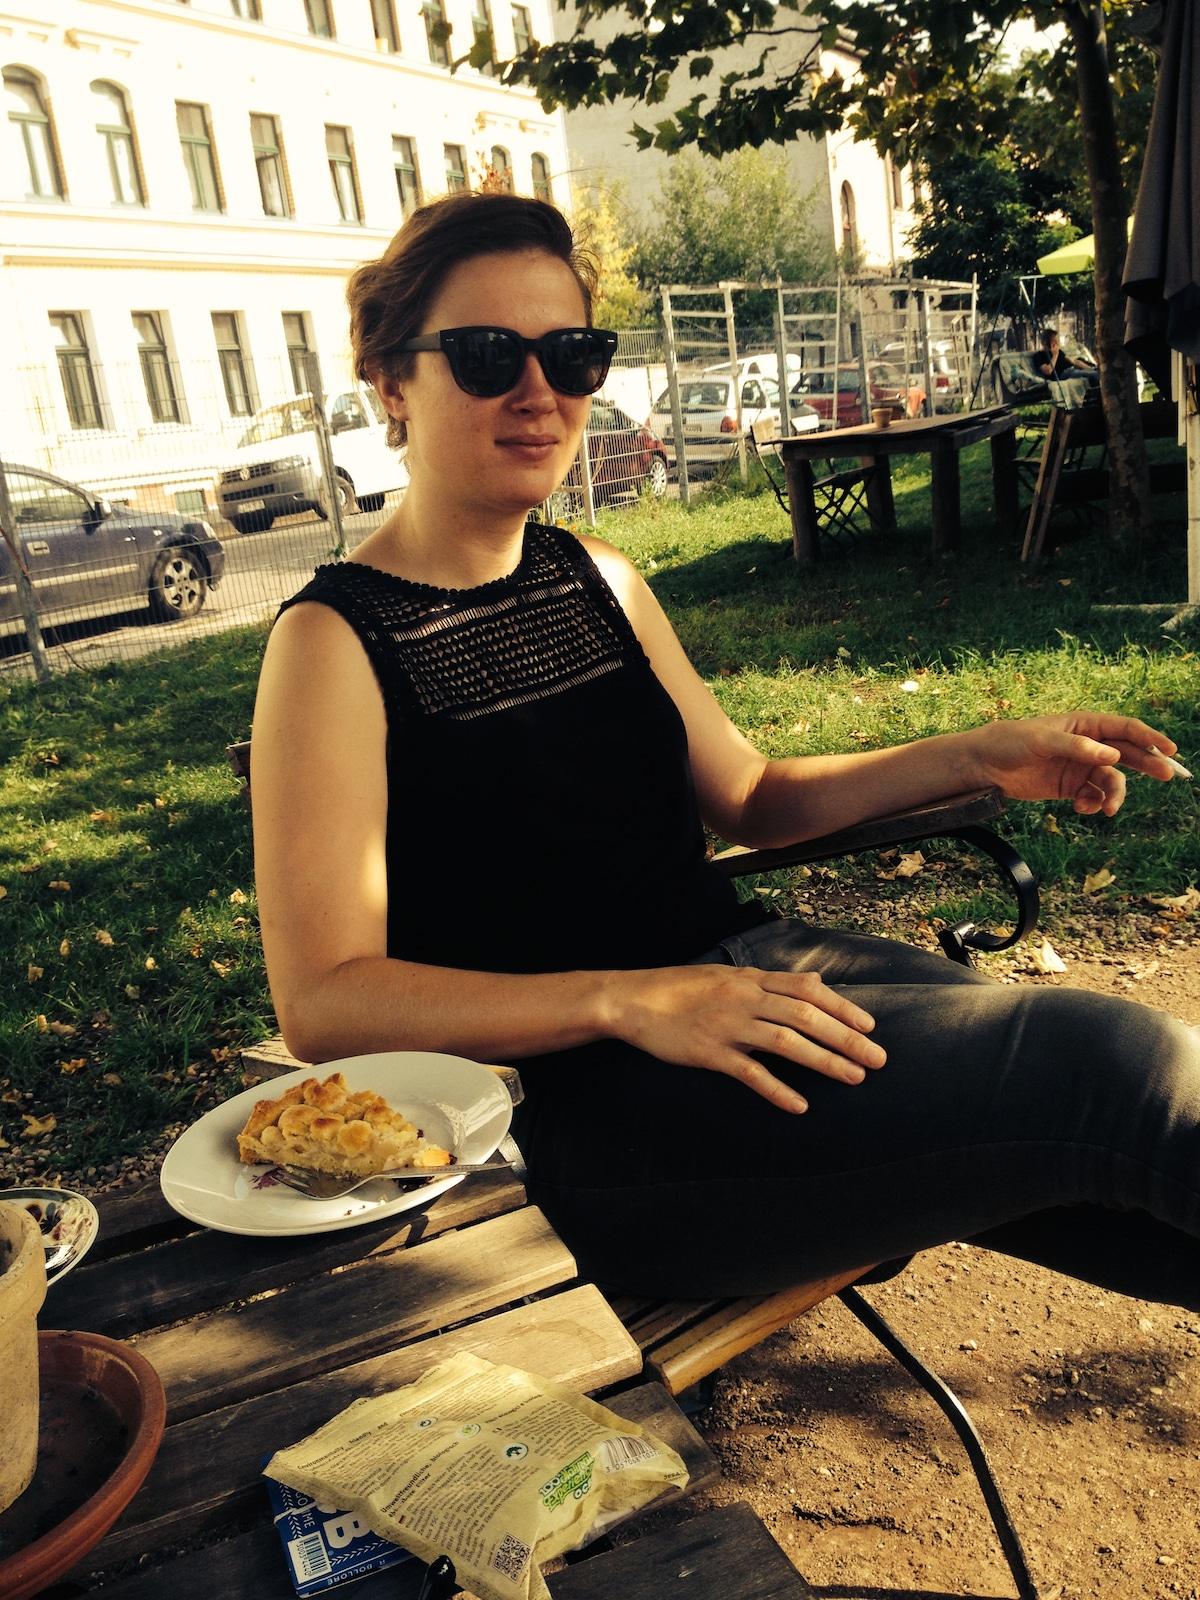 Nele from Leipzig